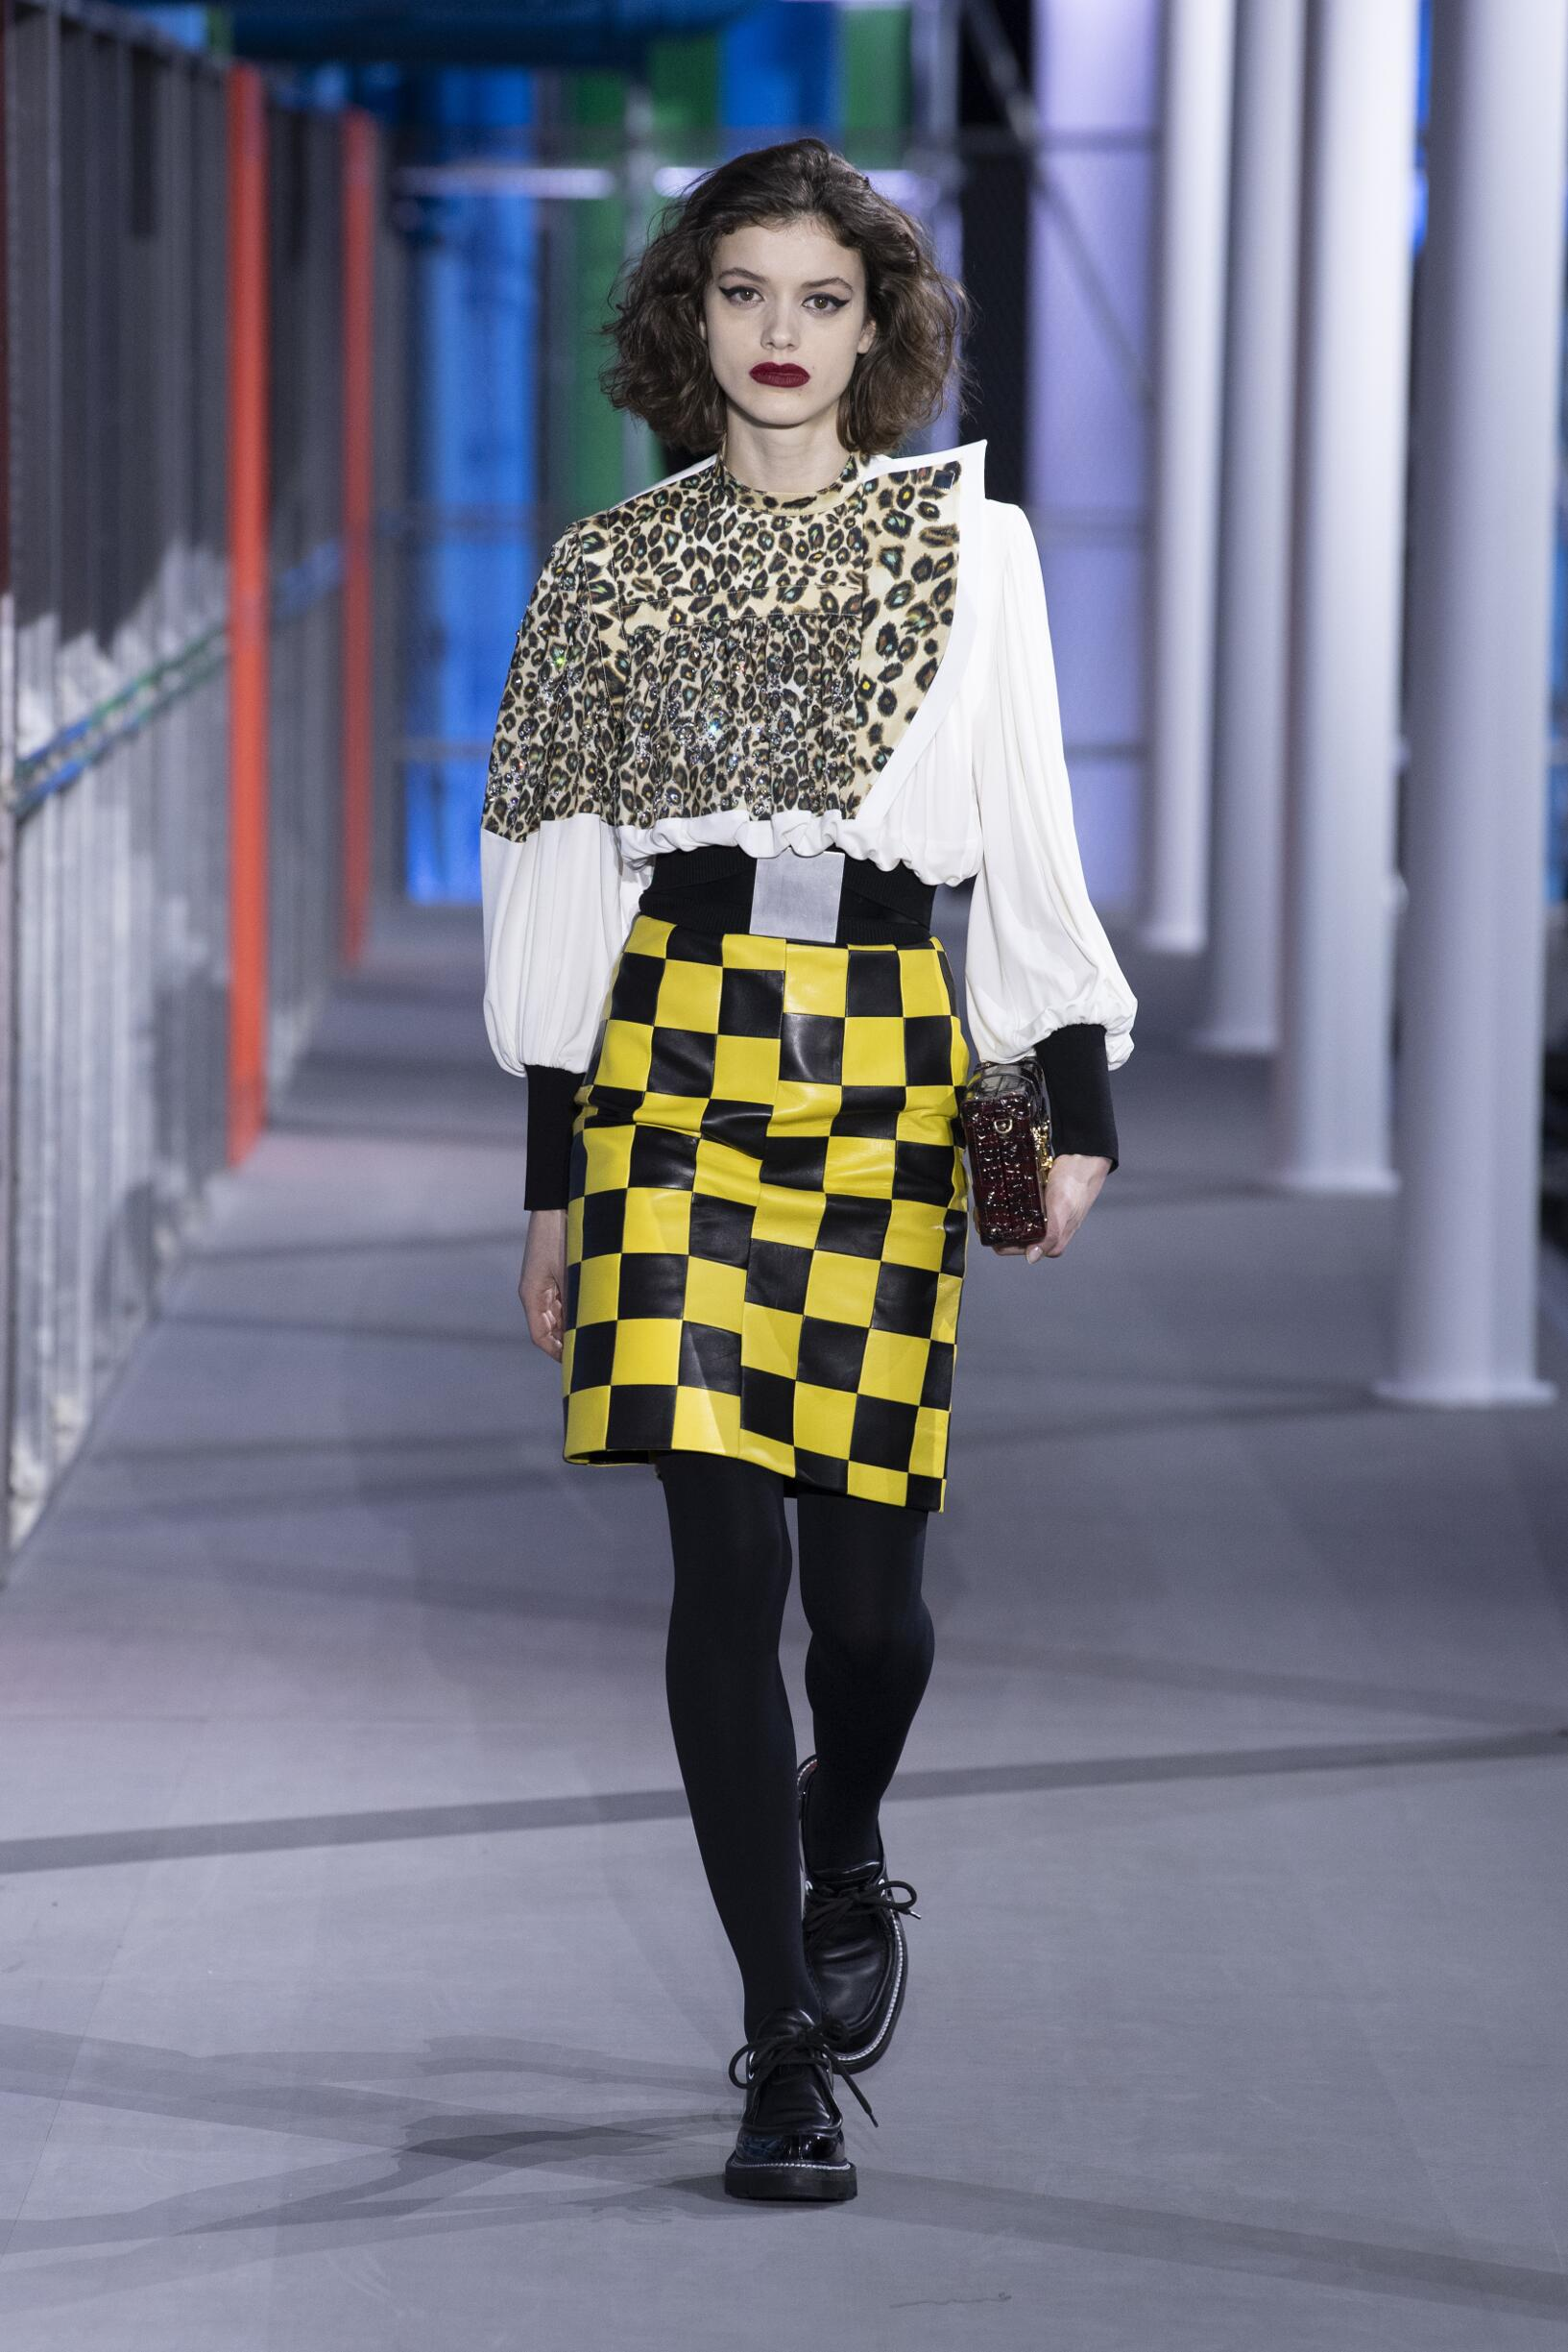 Fashion Show Woman Model Louis Vuitton Catwalk